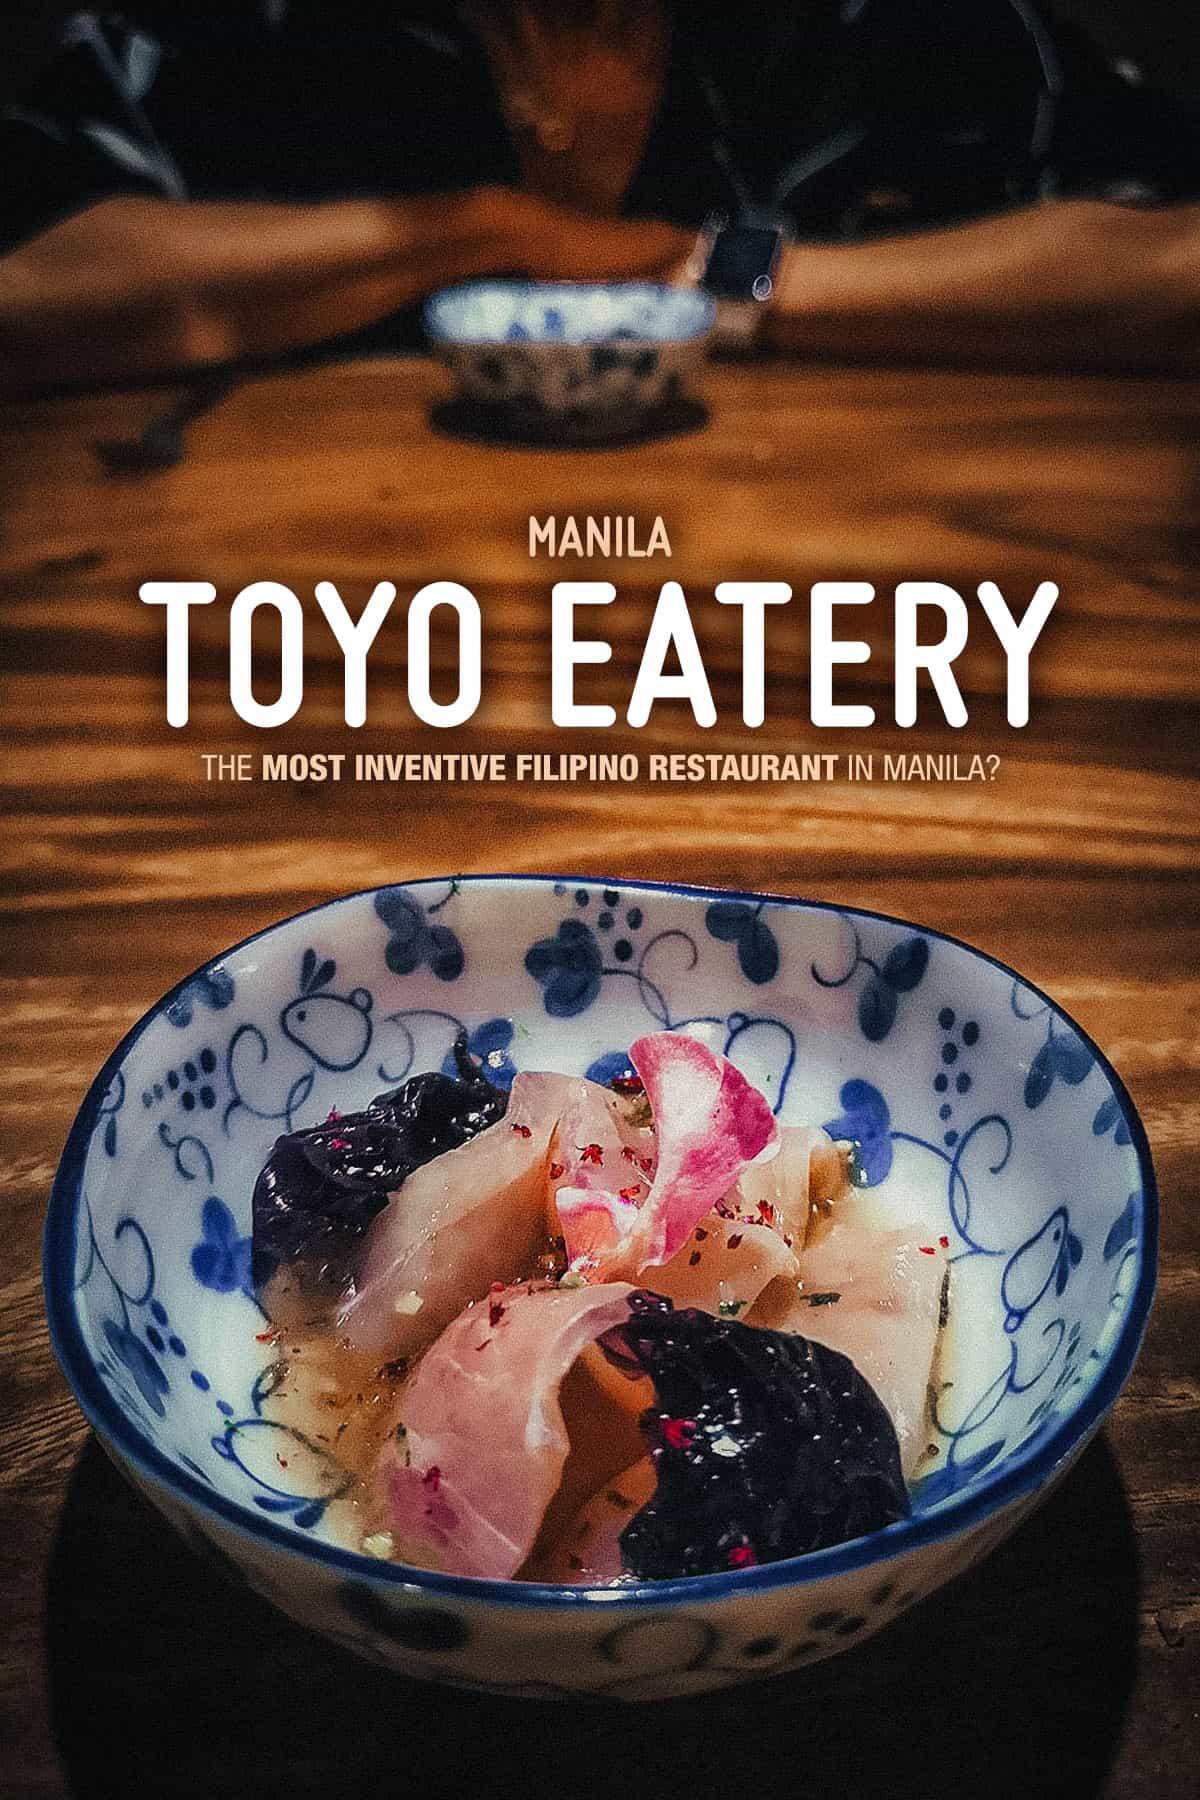 Toyo Eatery, Manila, Philippines